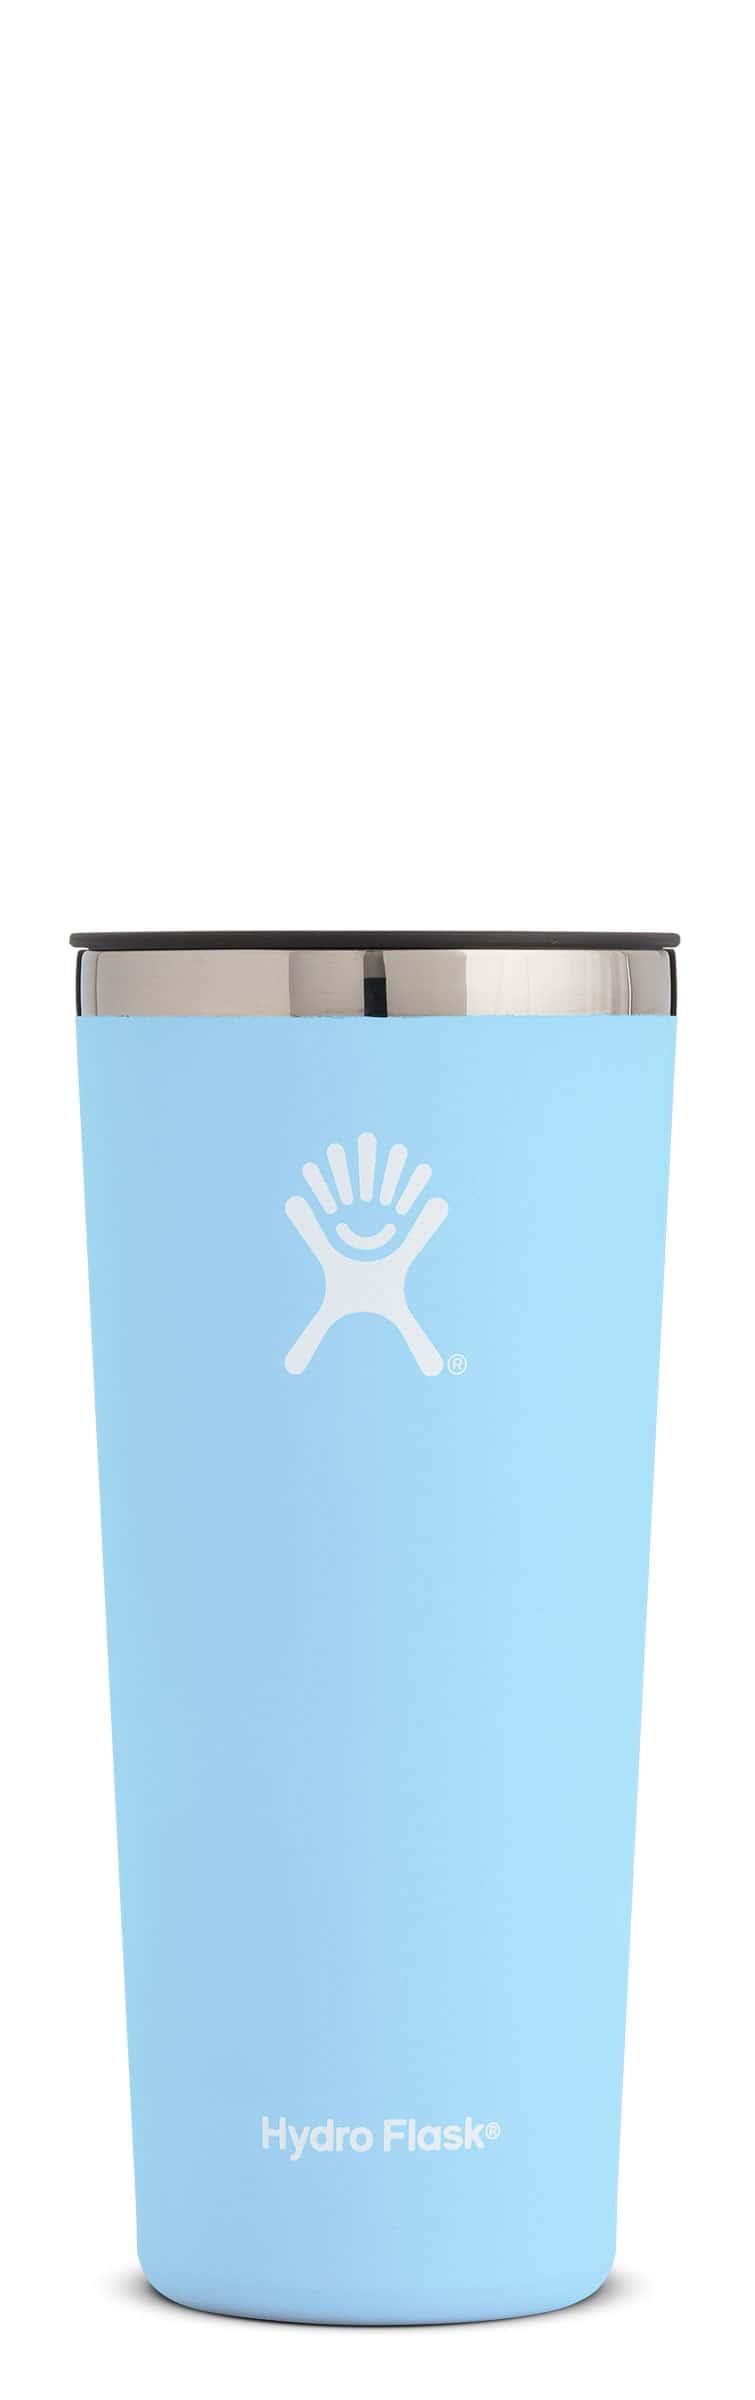 Hydro Flask-Hydro Flask 22oz Tumbler